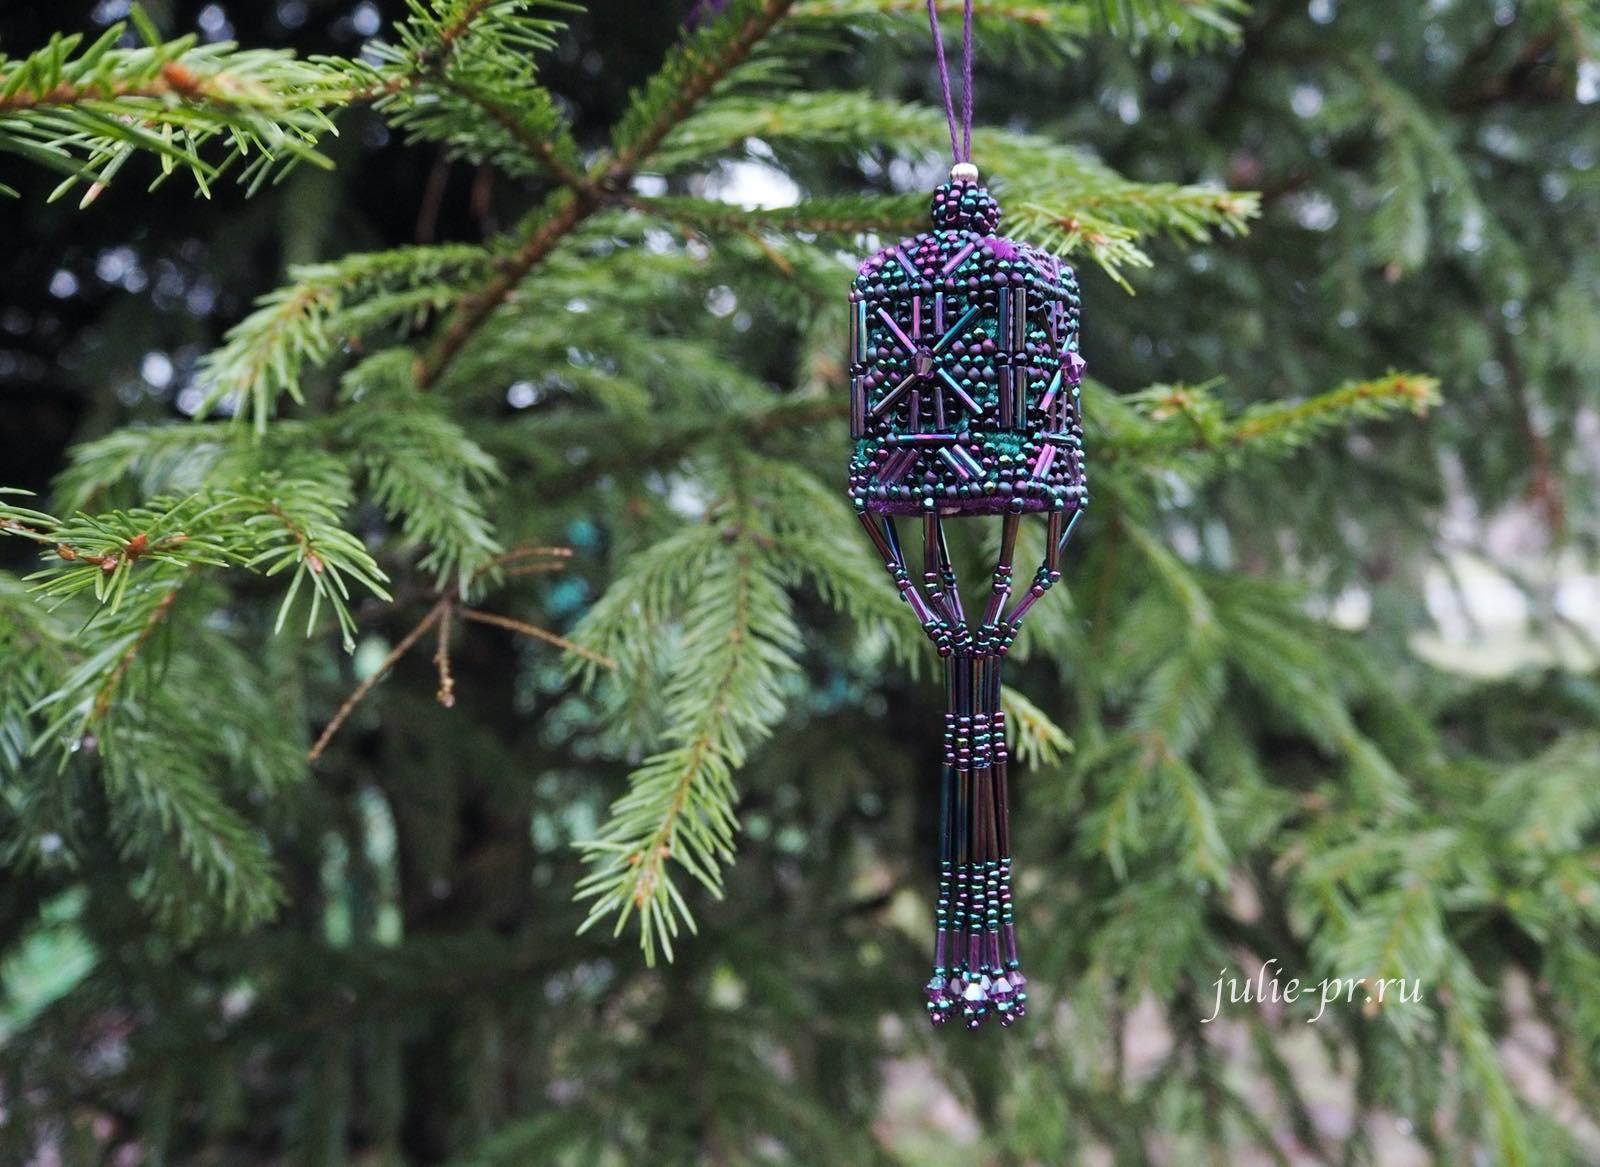 Фонарик Mill Hill MHBT4 — Rainbow Teal Tassel, вышивка крестом, вышивка бисером, елочная игрушка